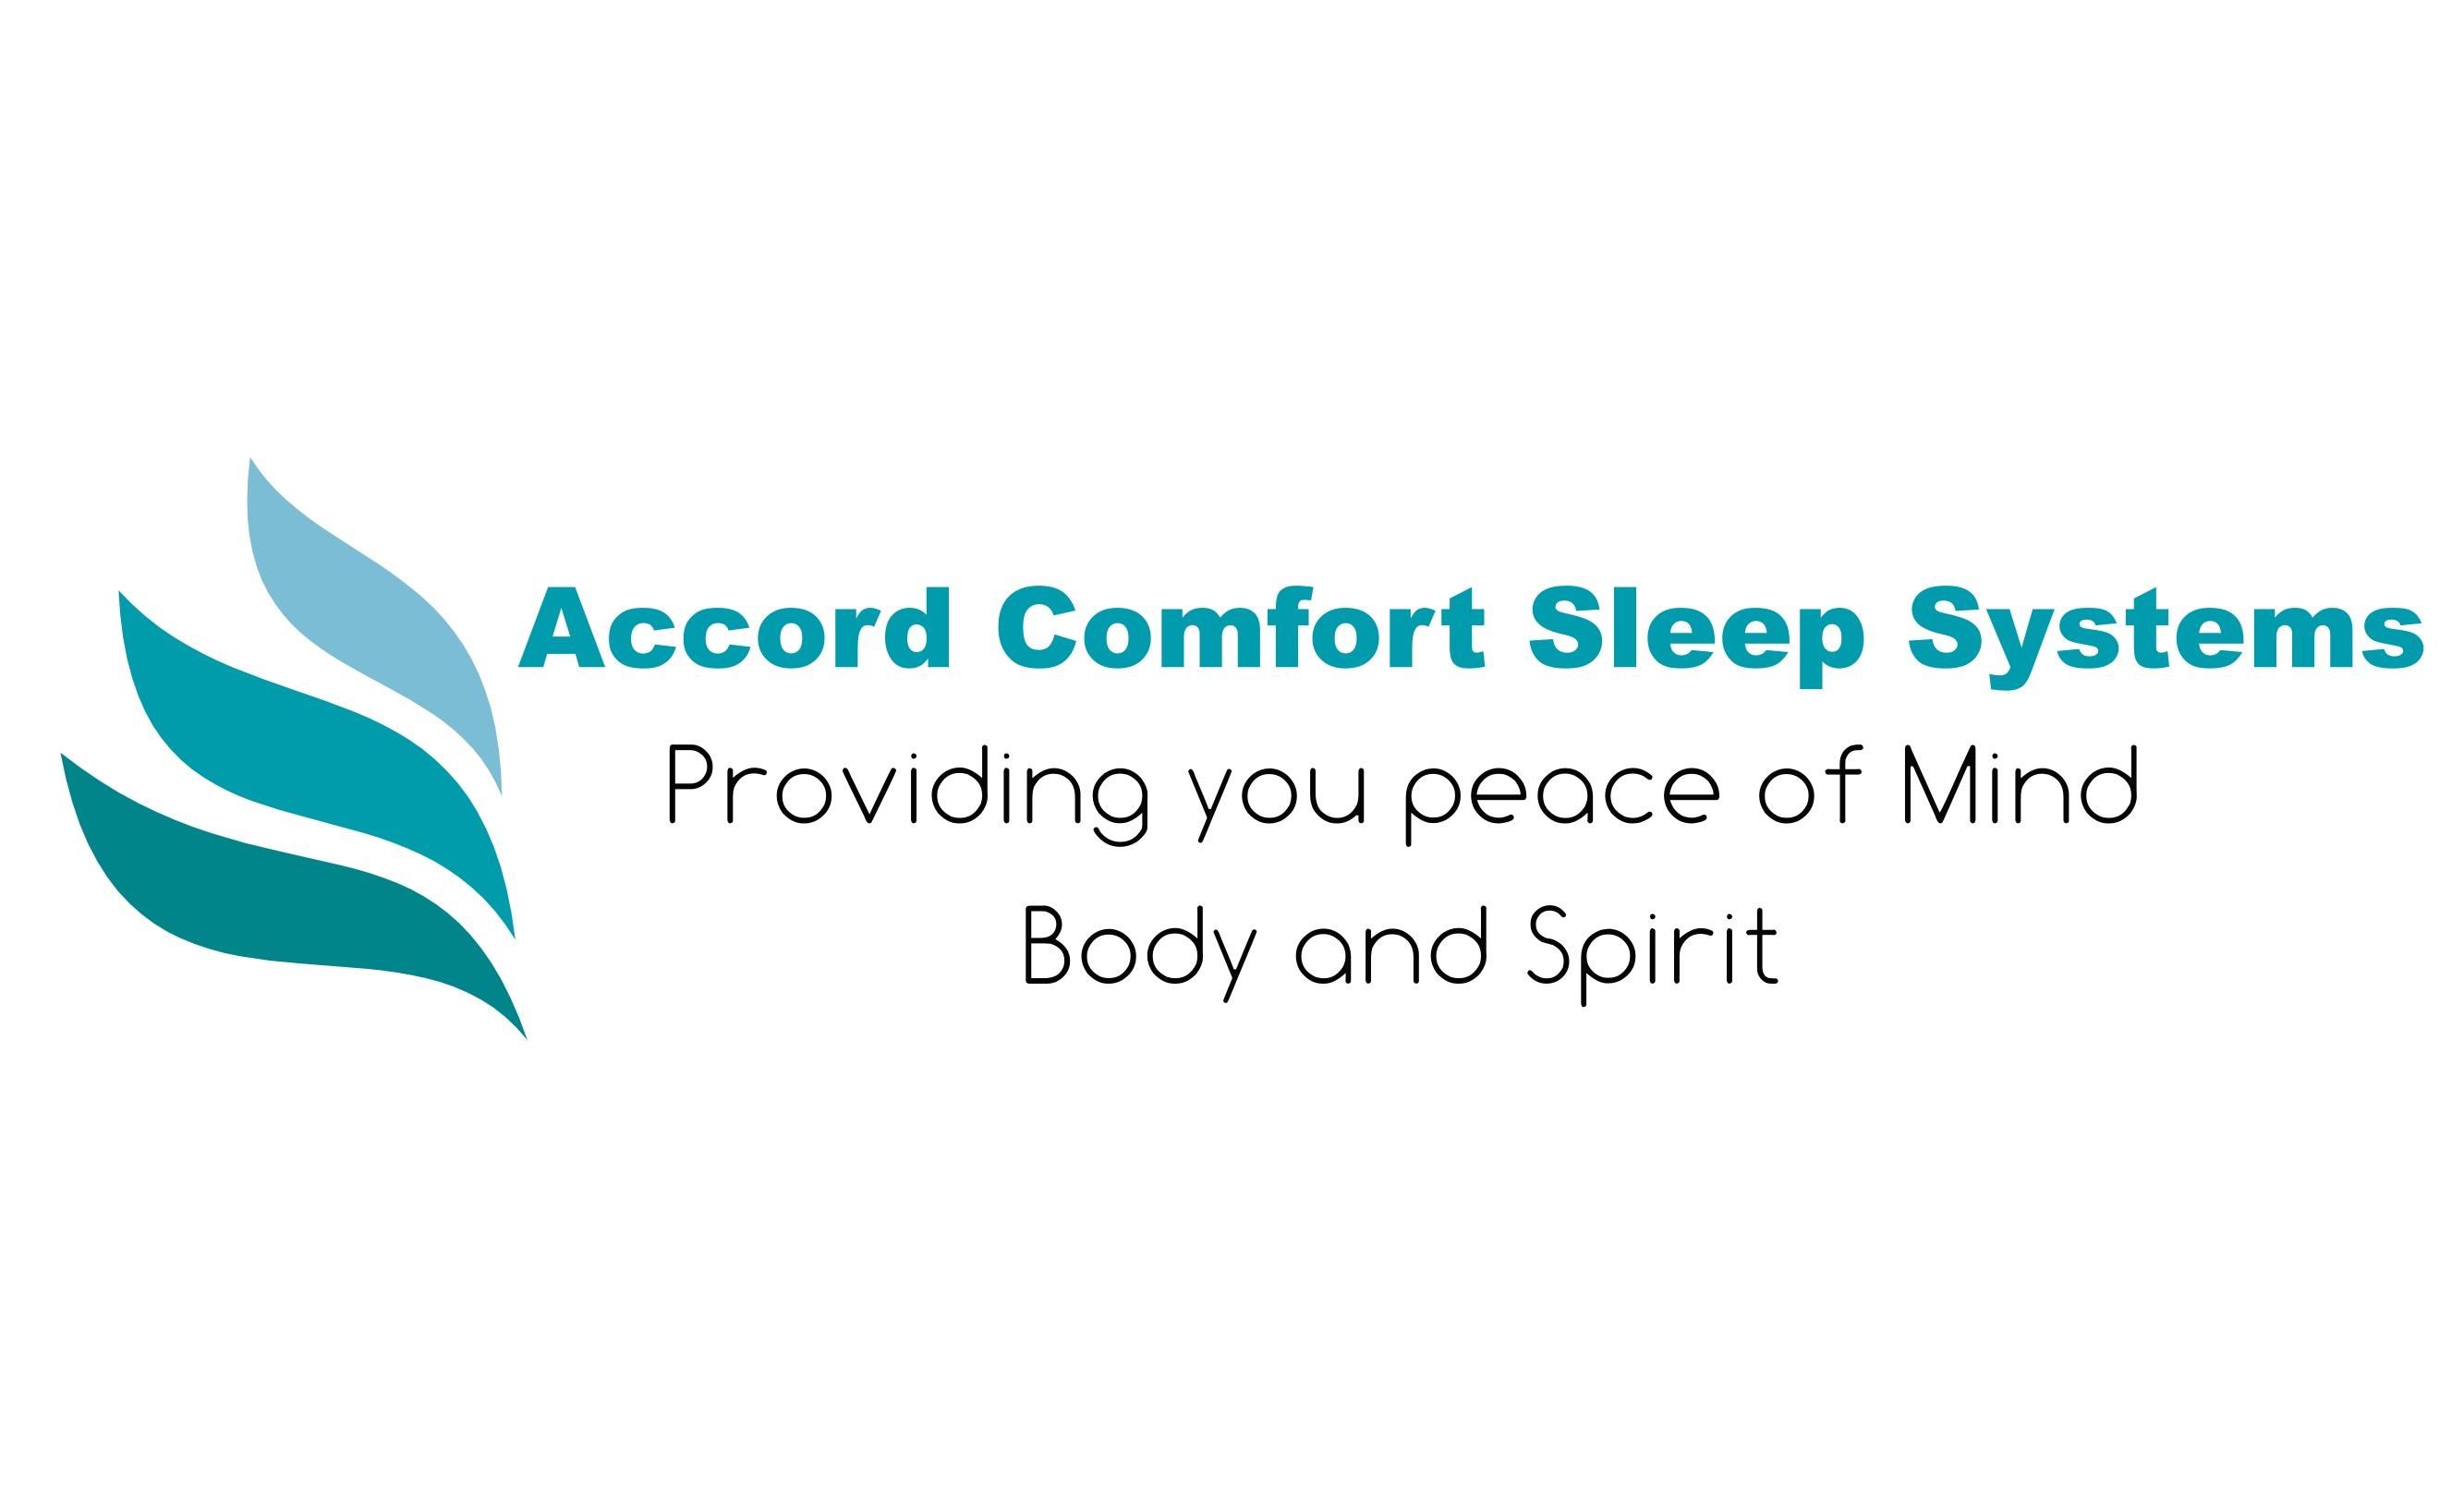 Accord Comfort Sleep Systems